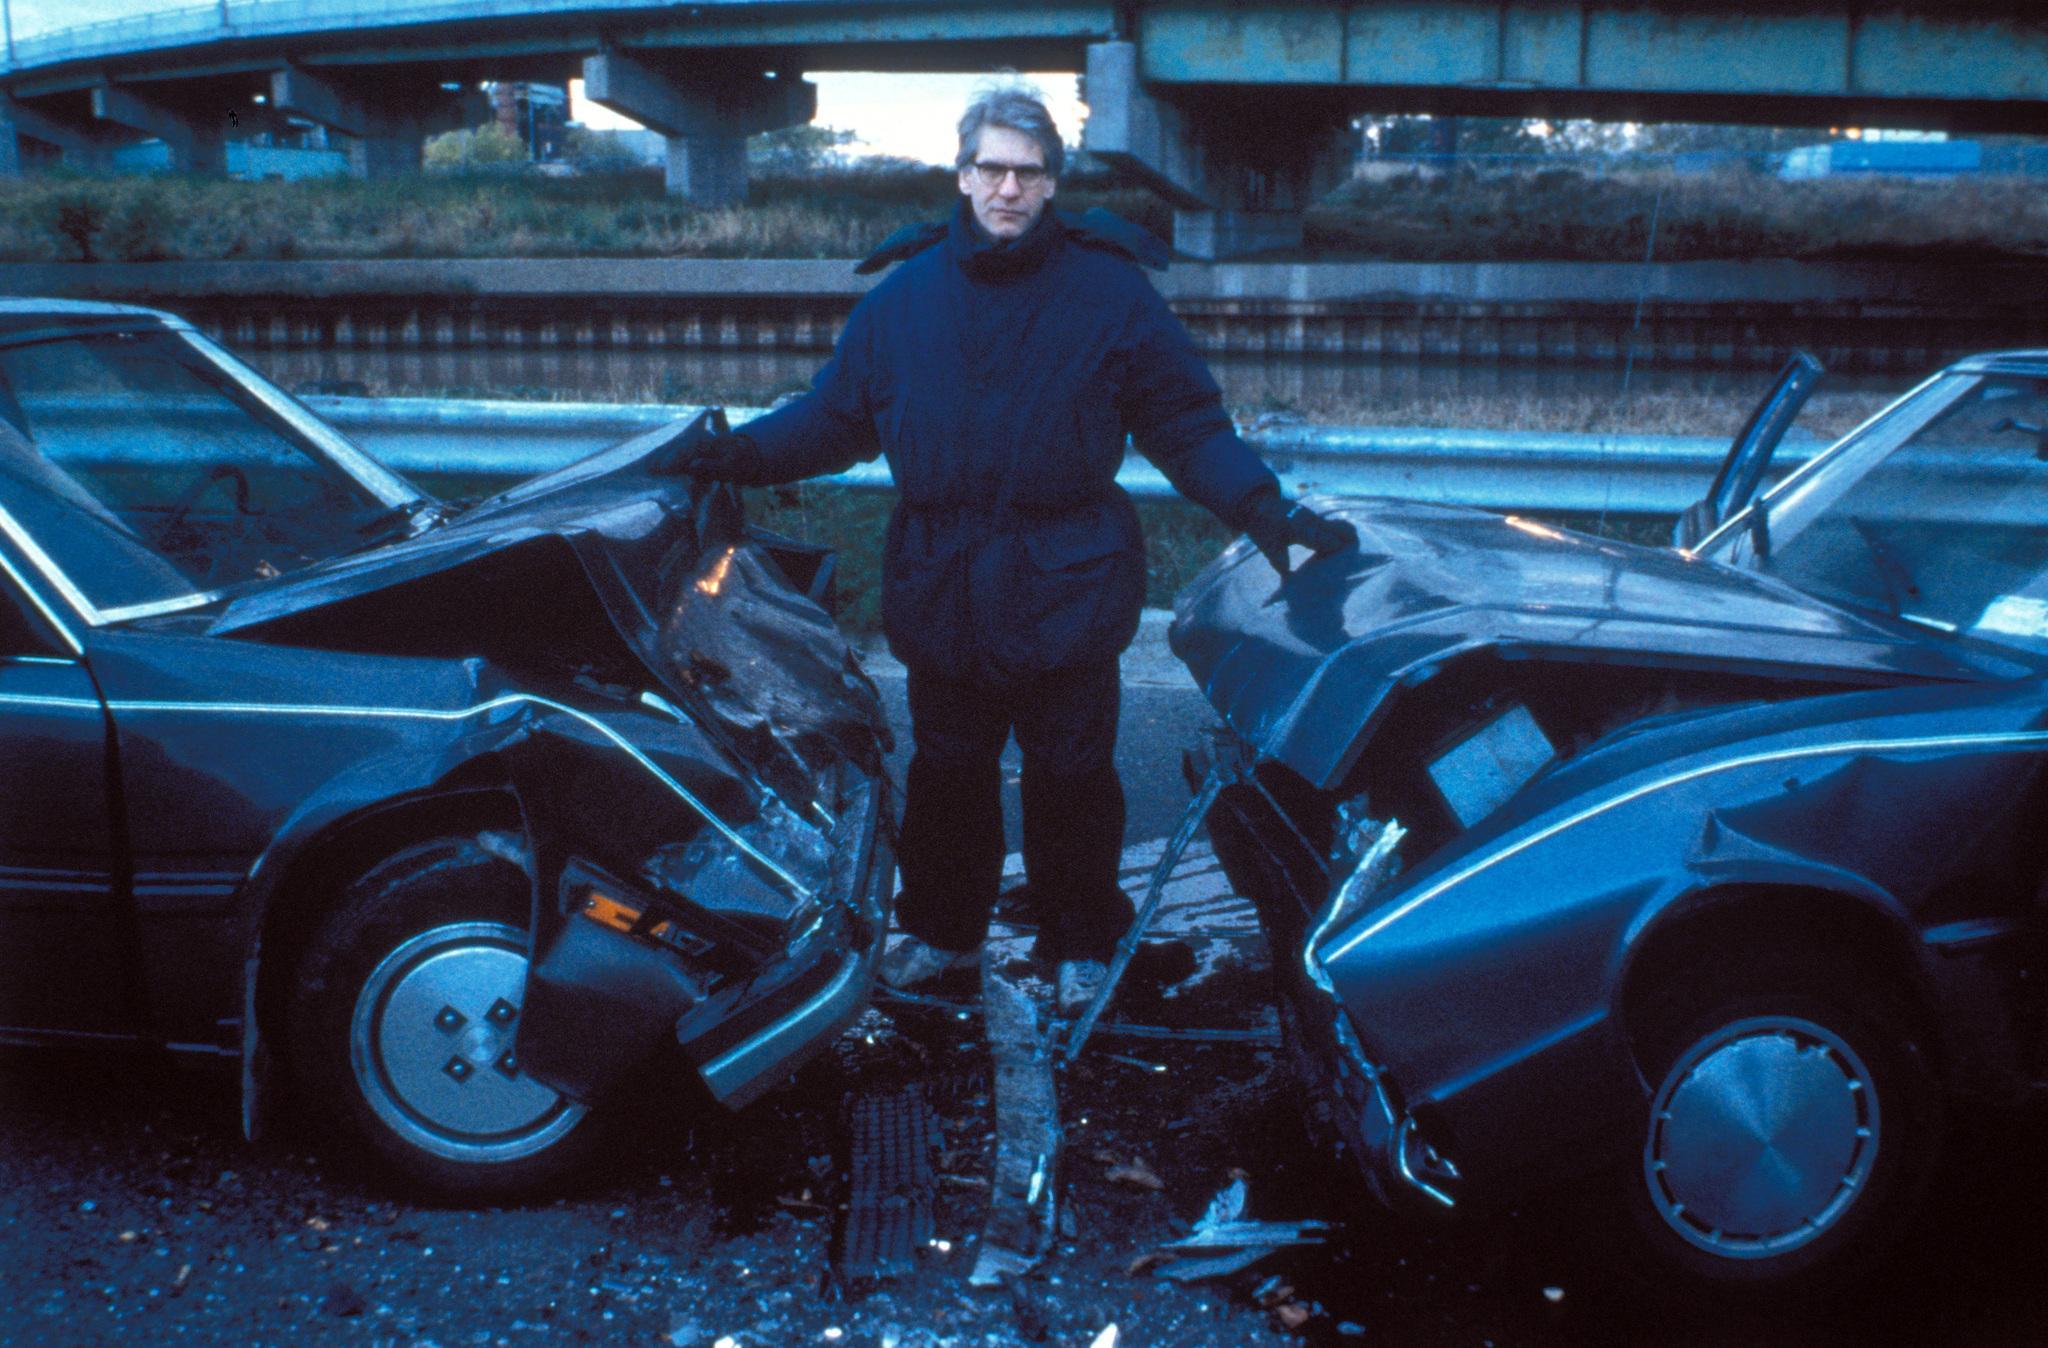 david-cronenberg-in-crash-large-picture